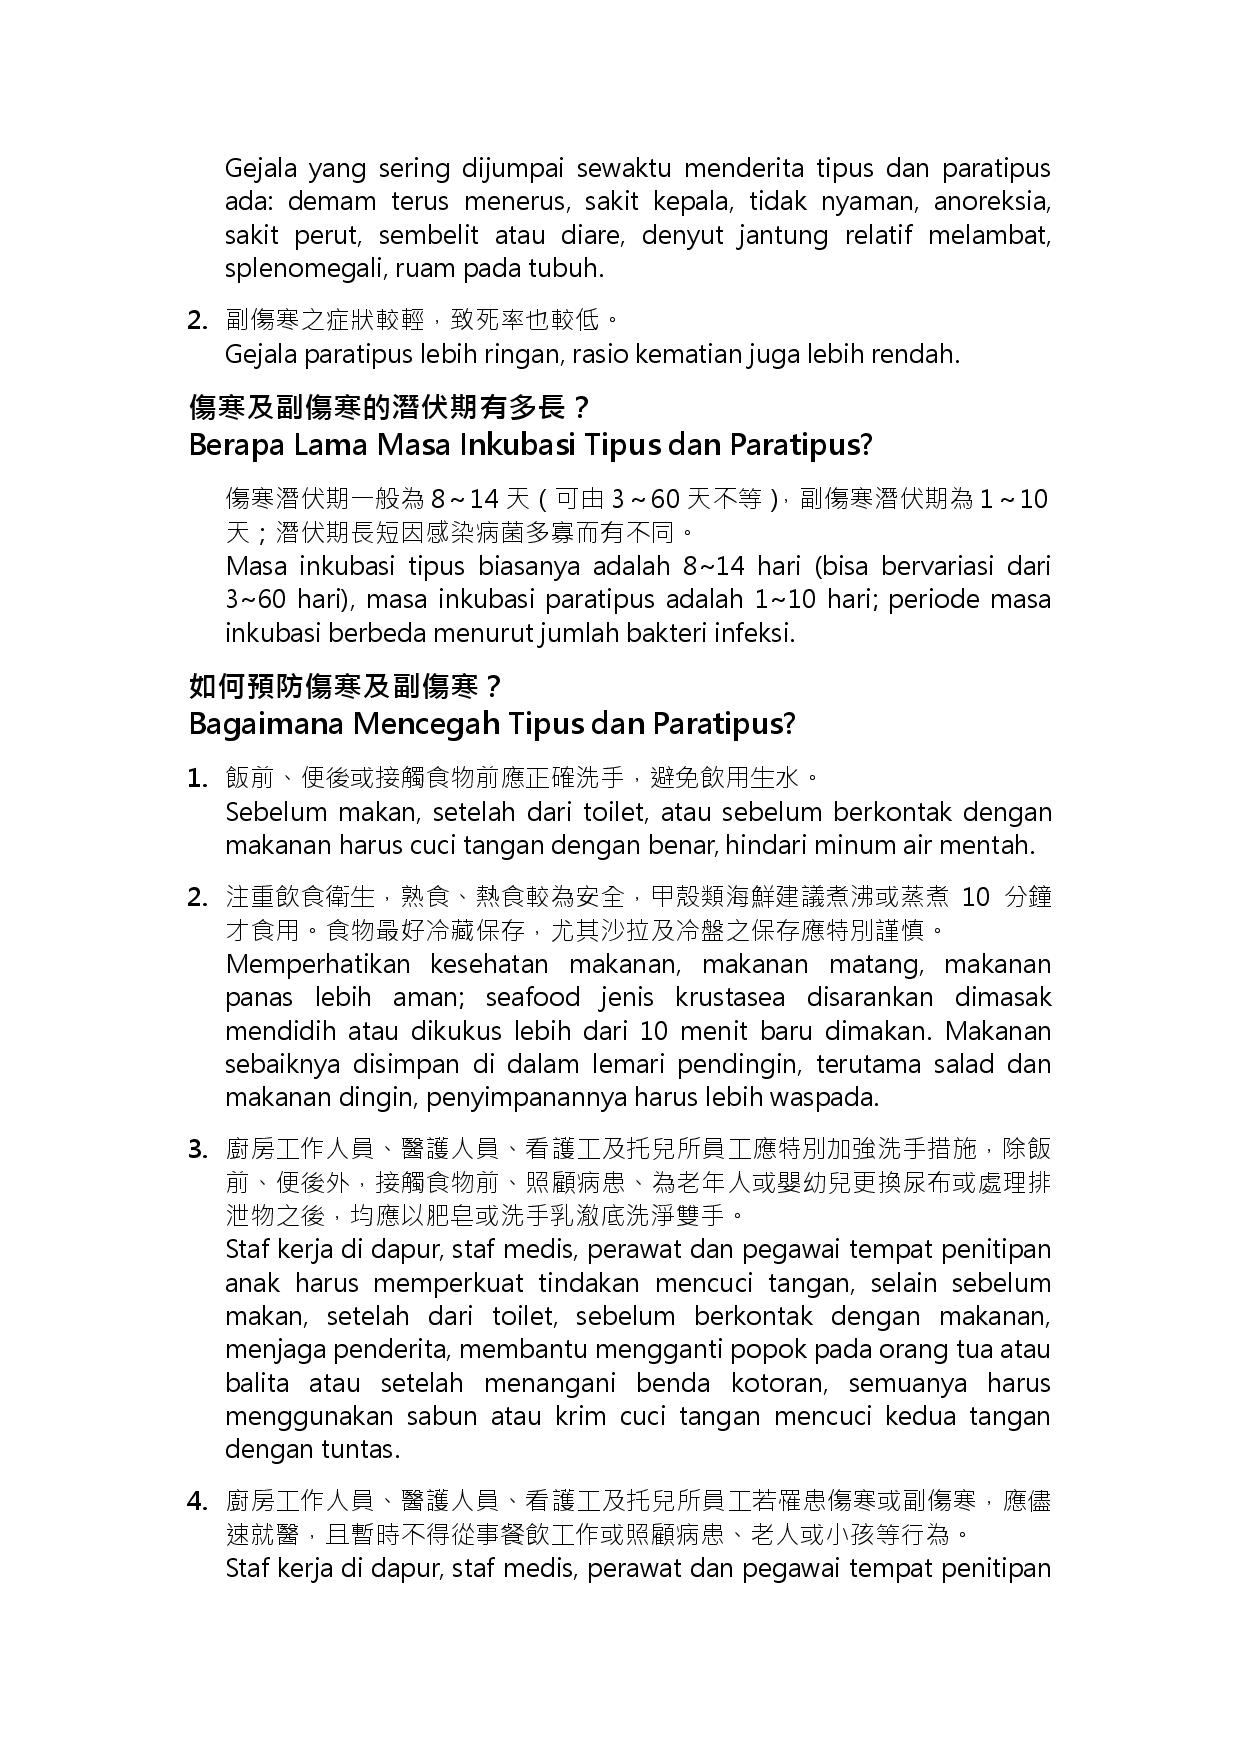 詳如附件【Klik】Mencegah Tipus dan Paratipus(Halaman 2)預防傷寒及副傷寒(印尼文)